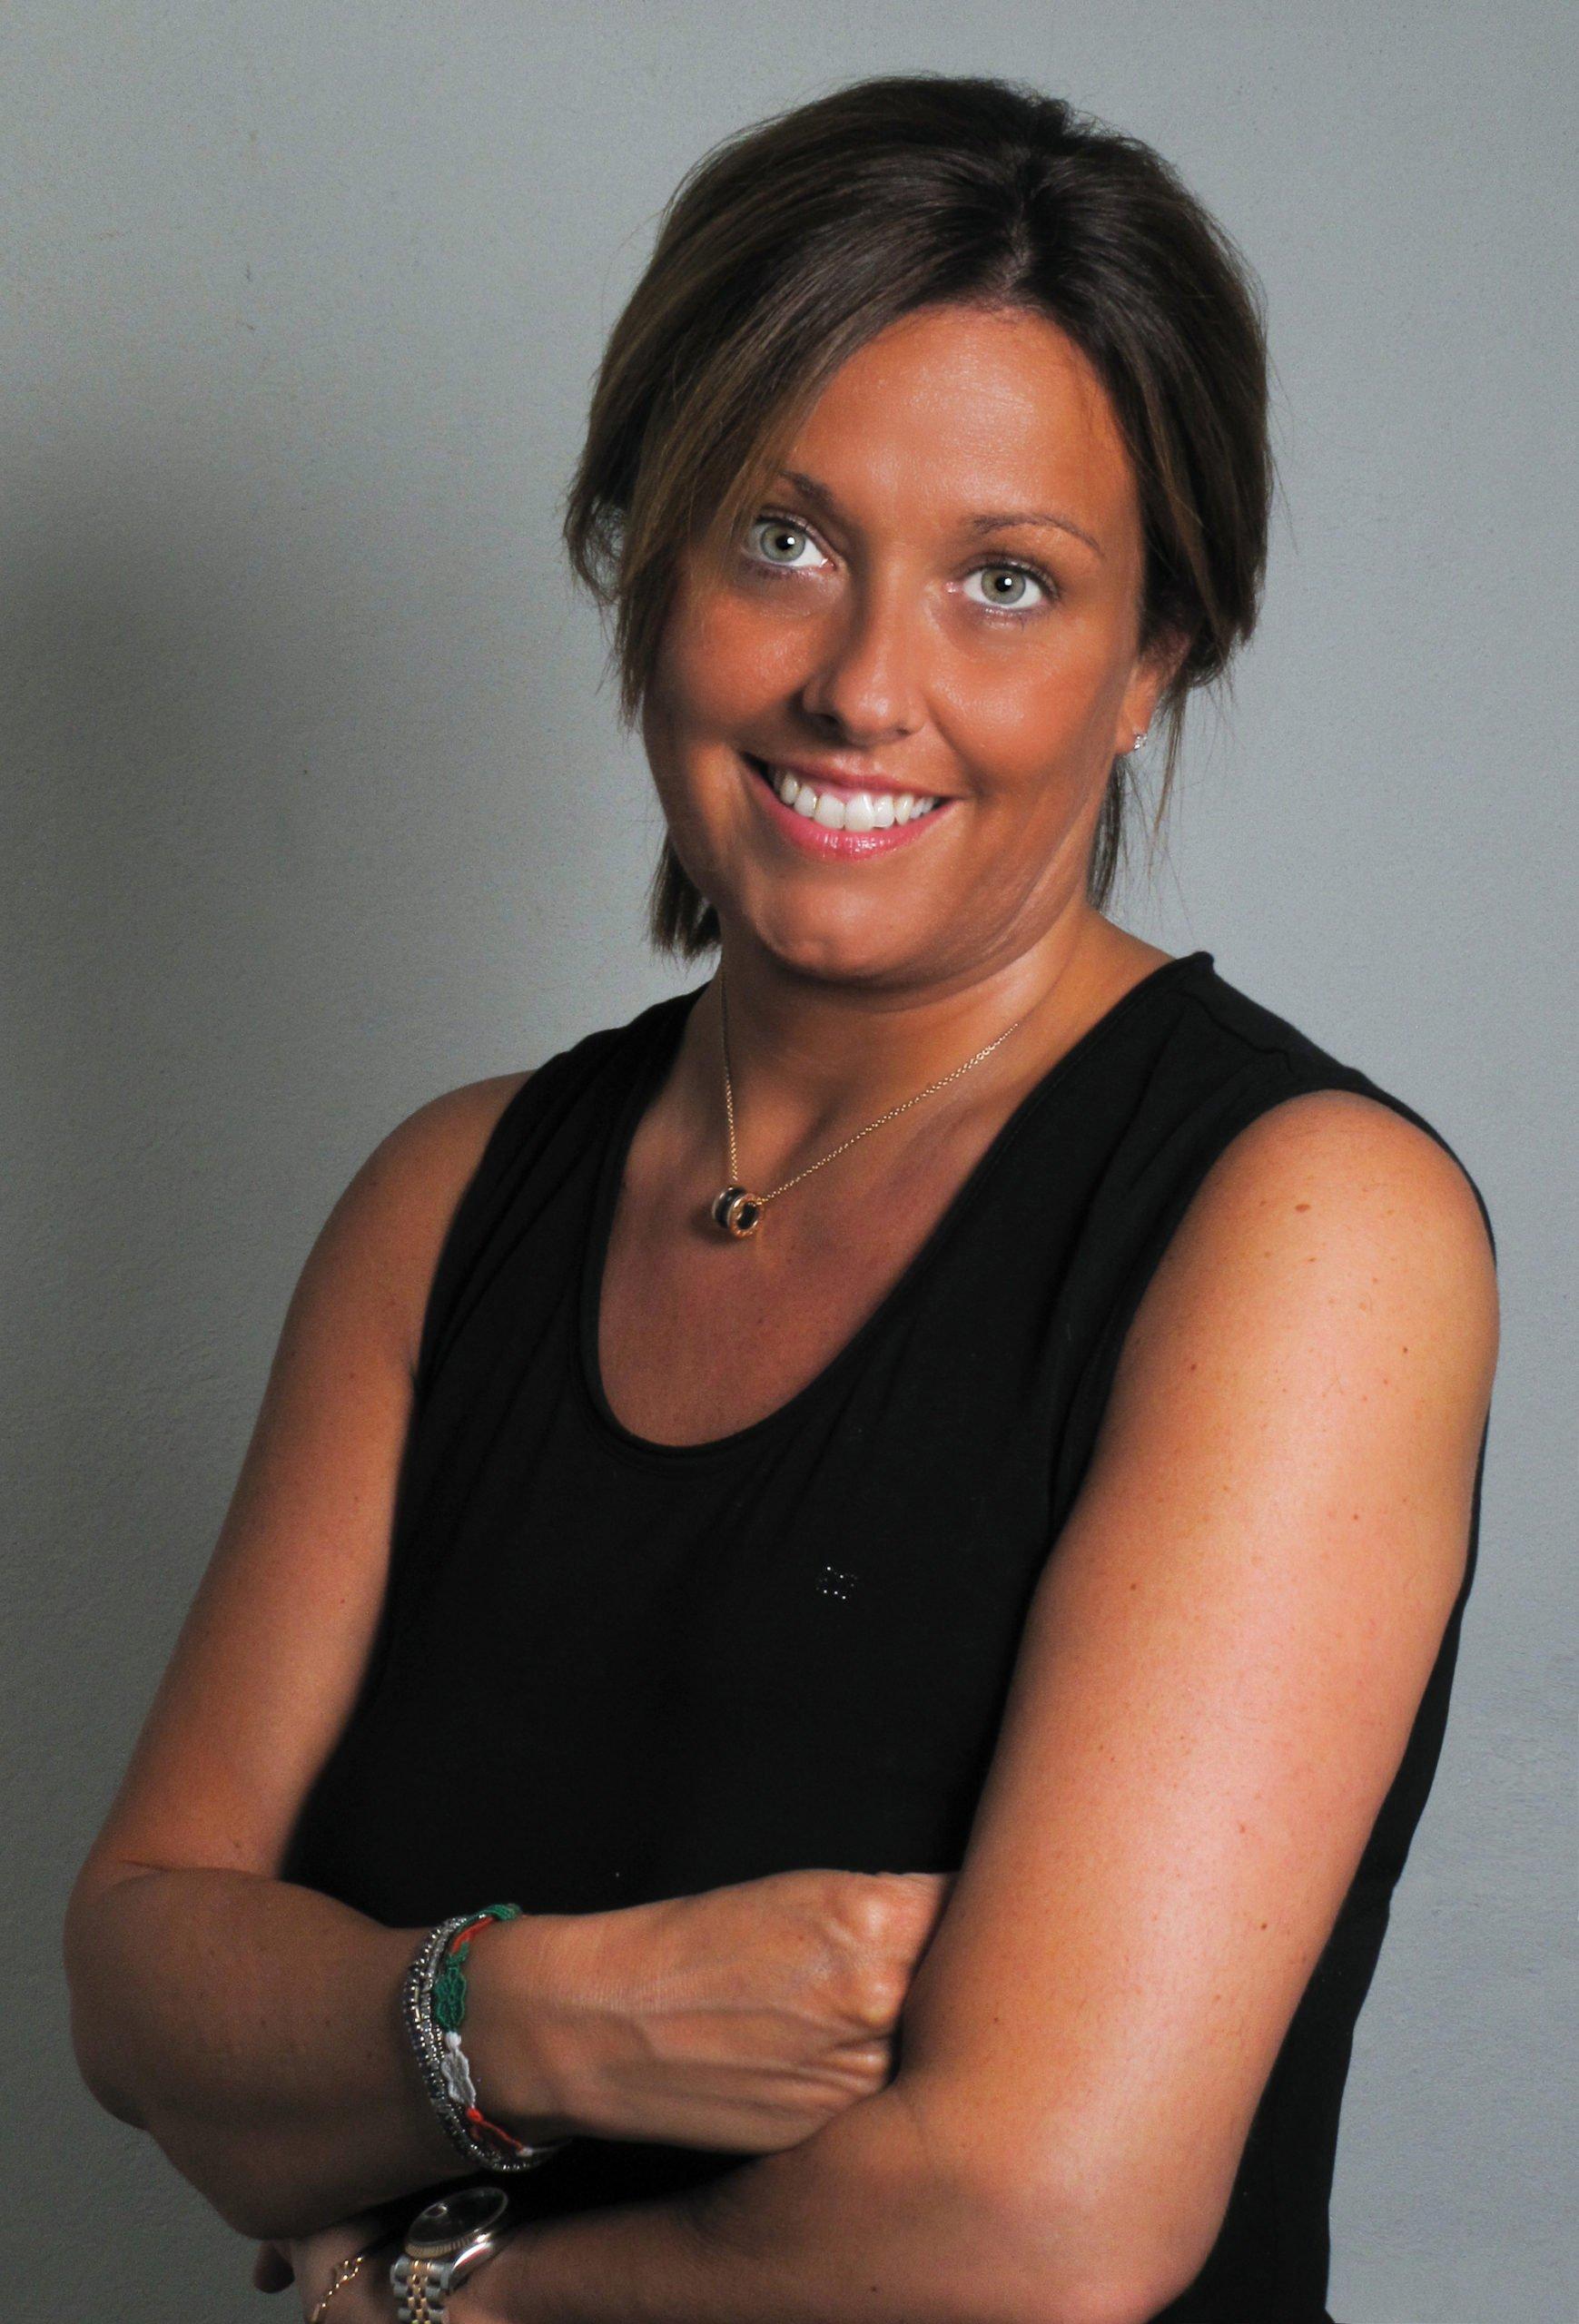 Anna Maria Borgogno